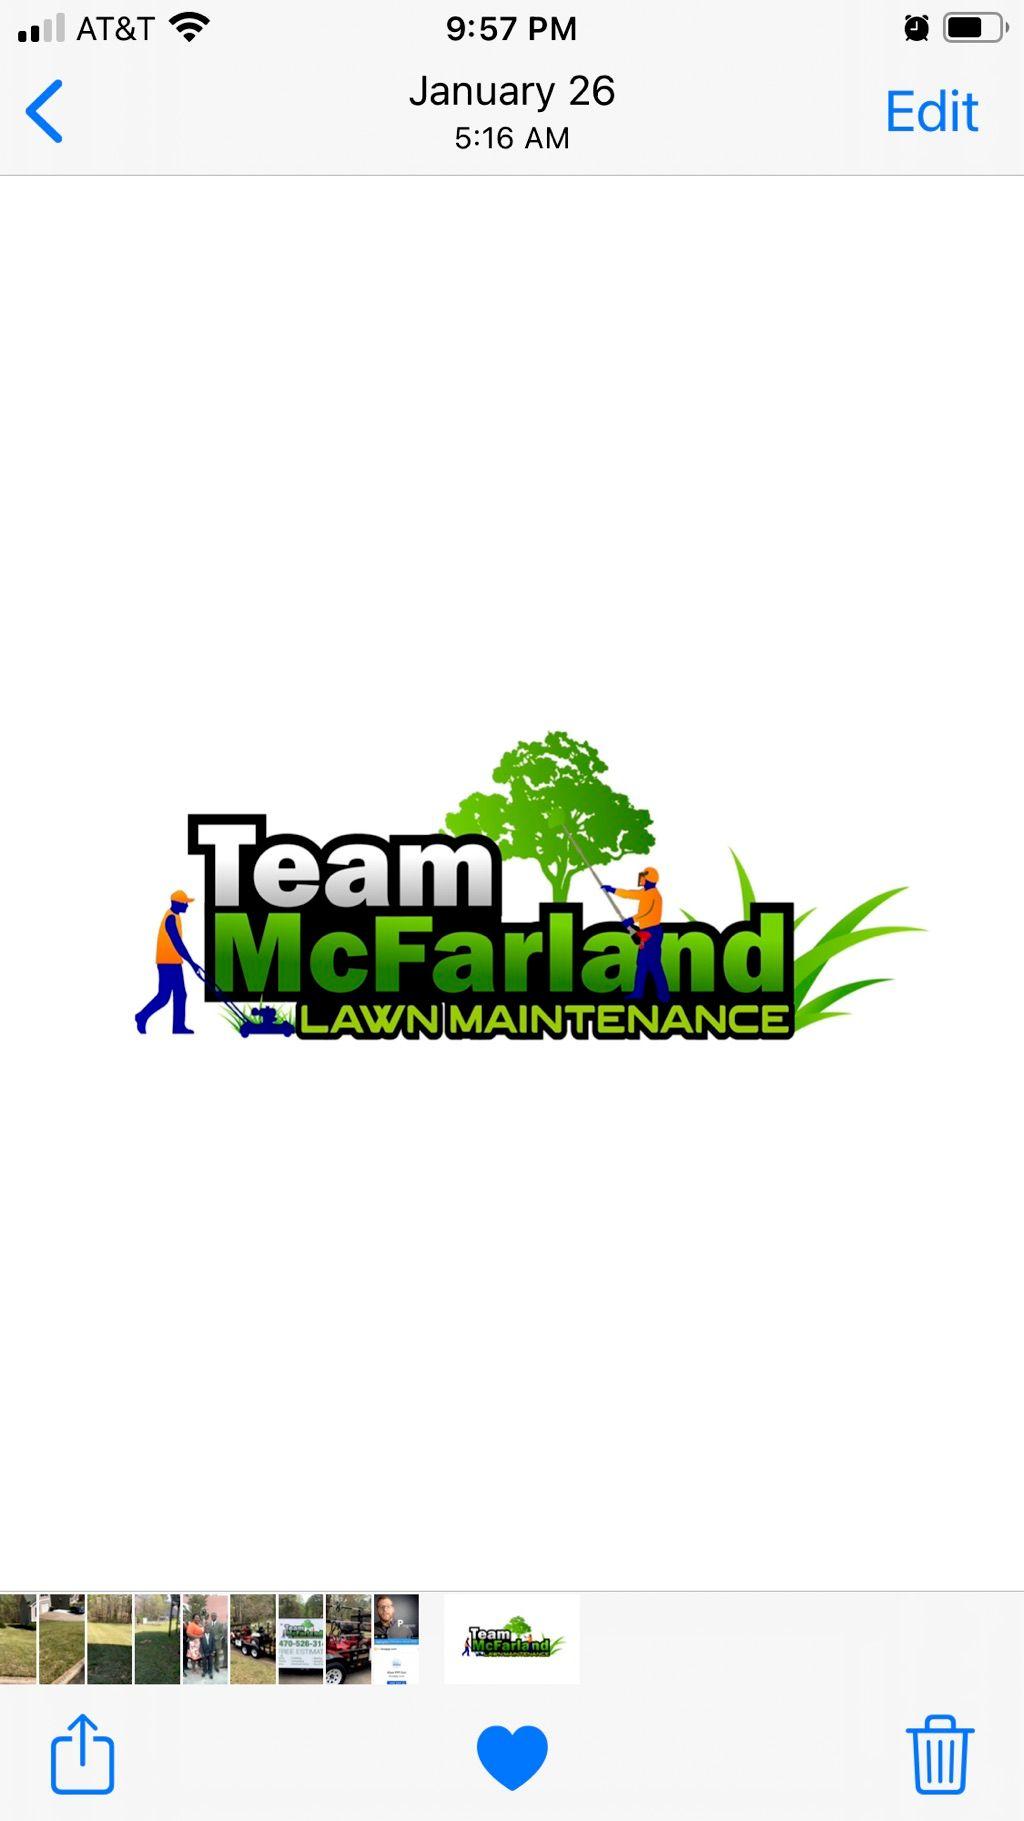 Team McFarland Lawn Maintenance